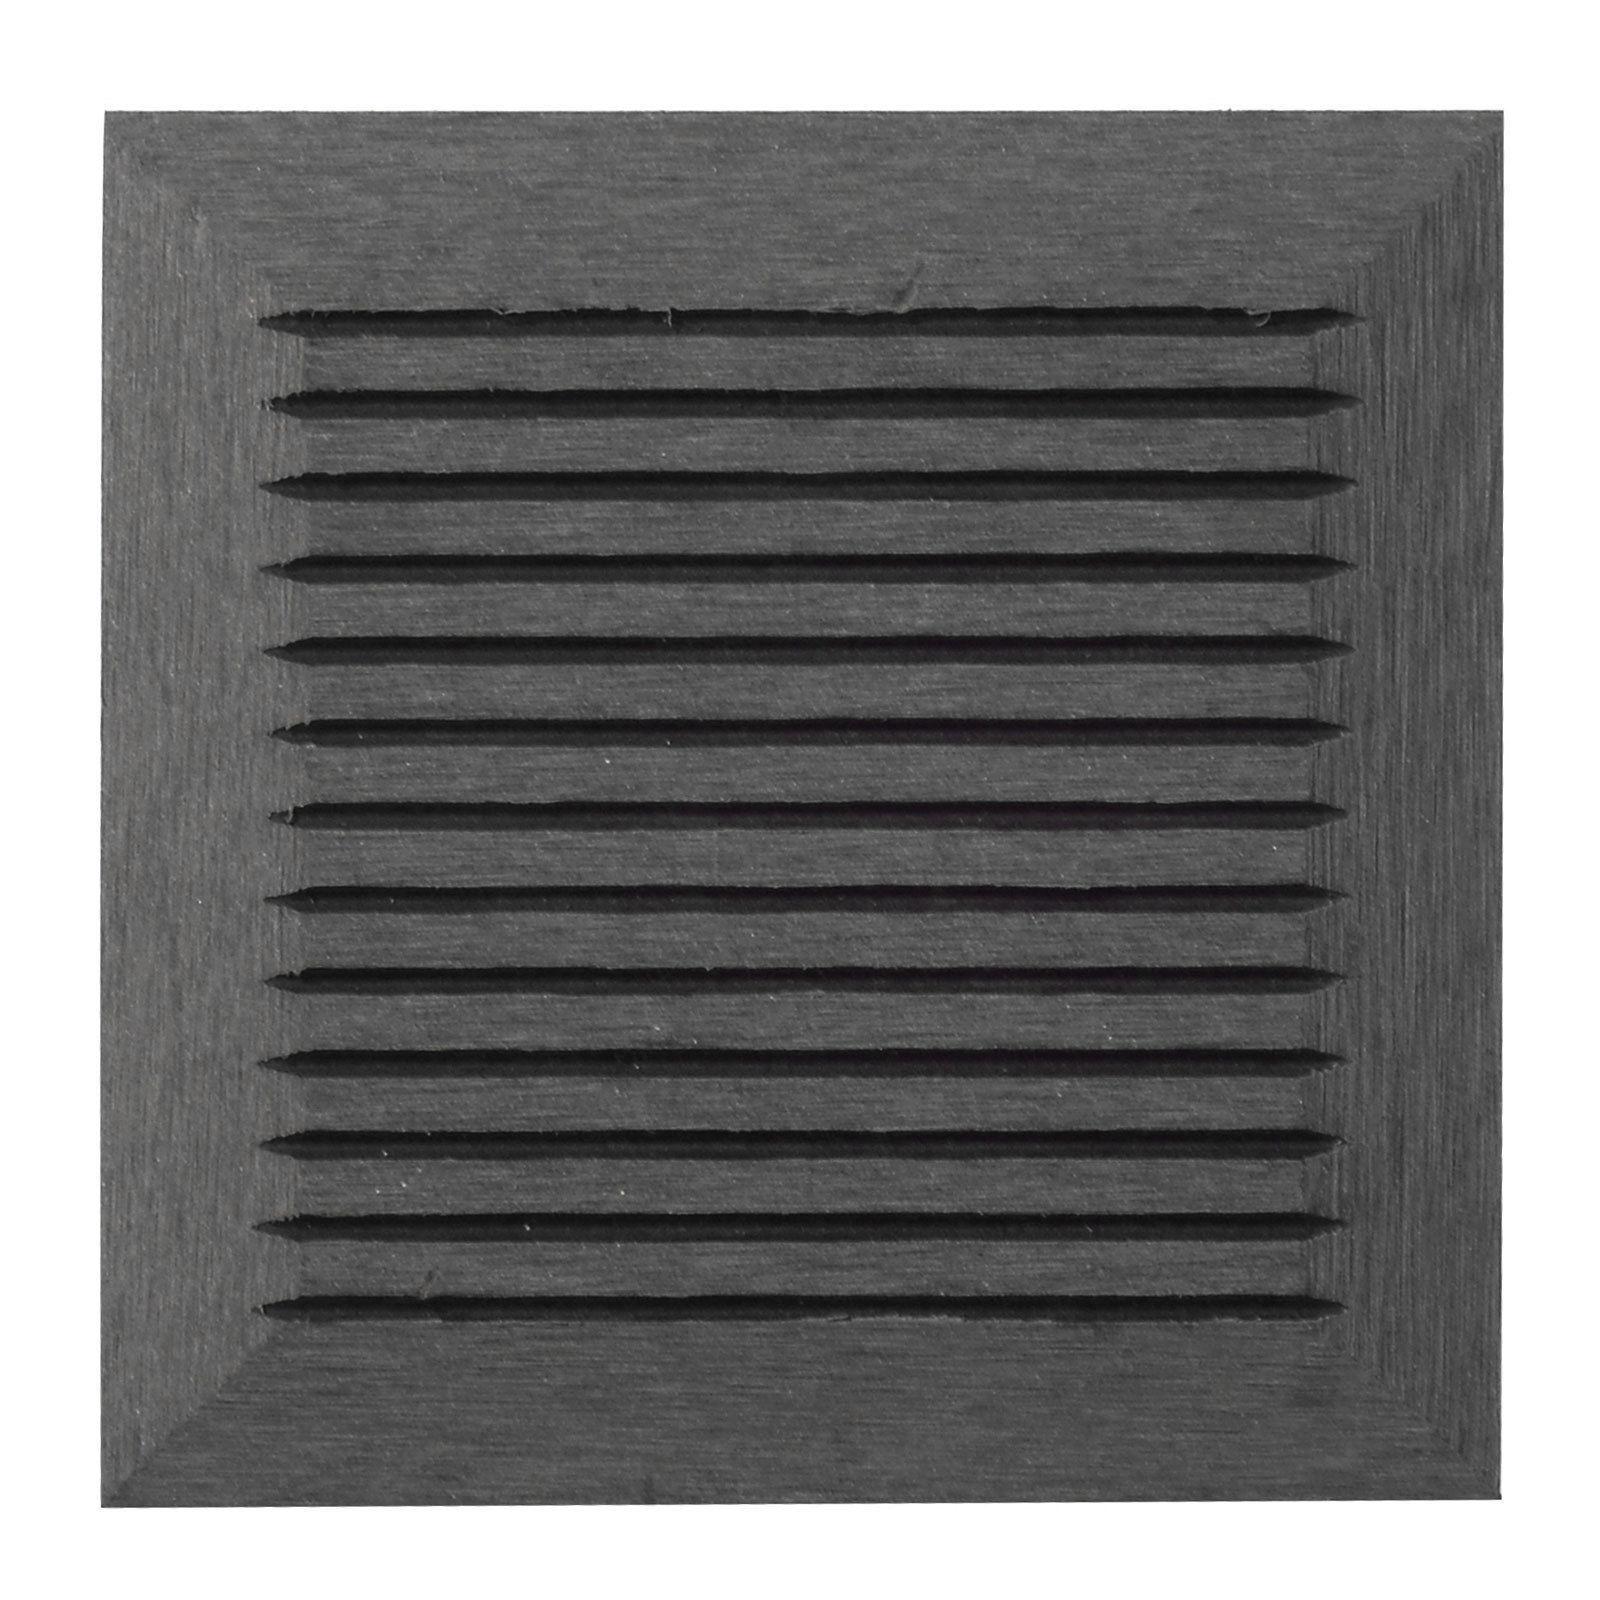 wpc zaun sichtschutzzaun gartenzaun windschutz terrasse grau anthrazit 180 x 180 ebay. Black Bedroom Furniture Sets. Home Design Ideas